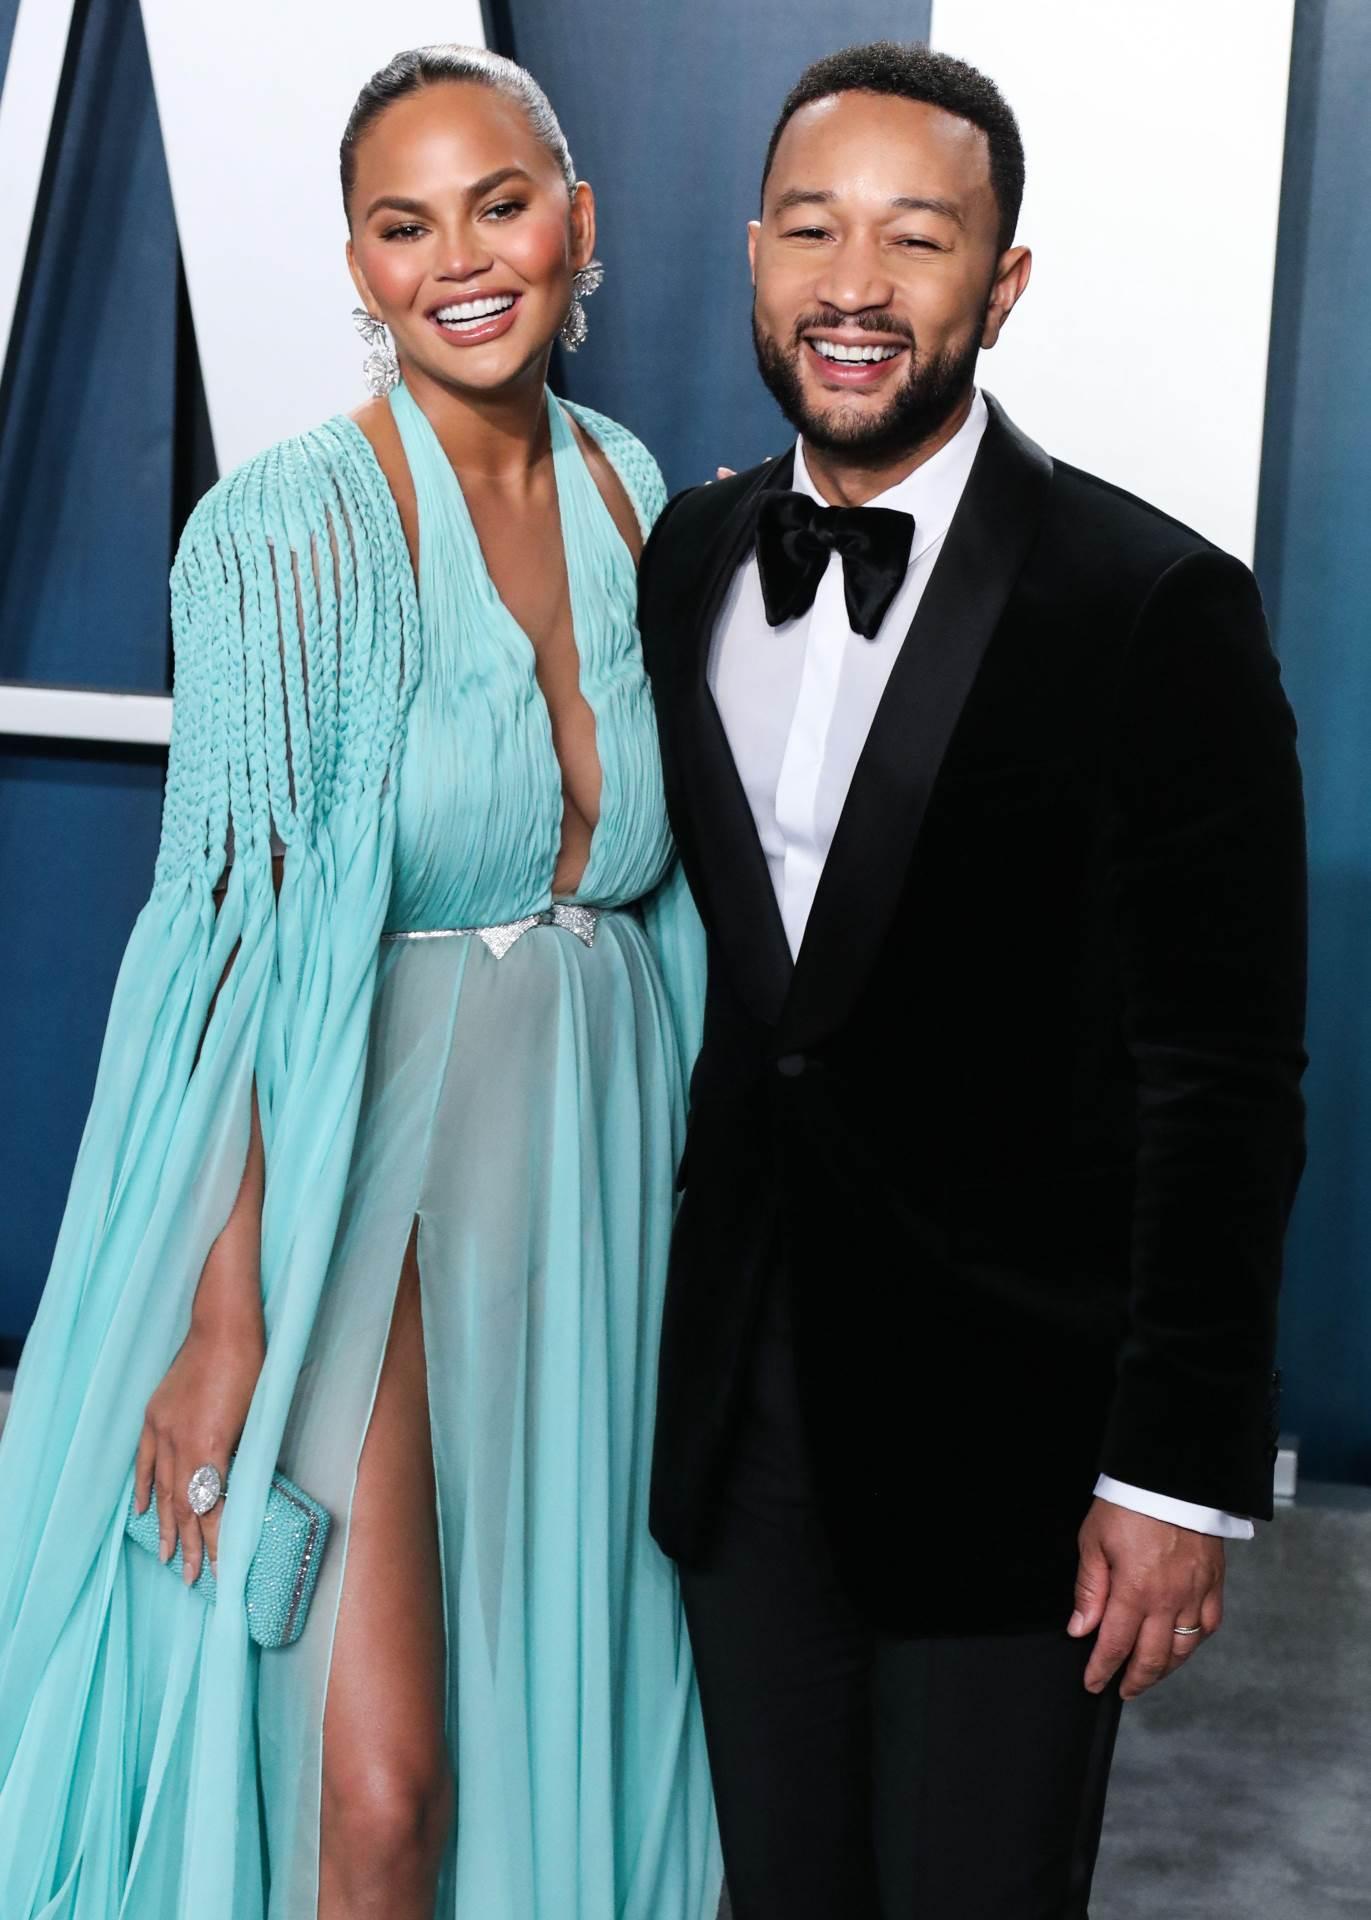 Chrissy Teigen i pjevač John Legend u braku su od 2013.